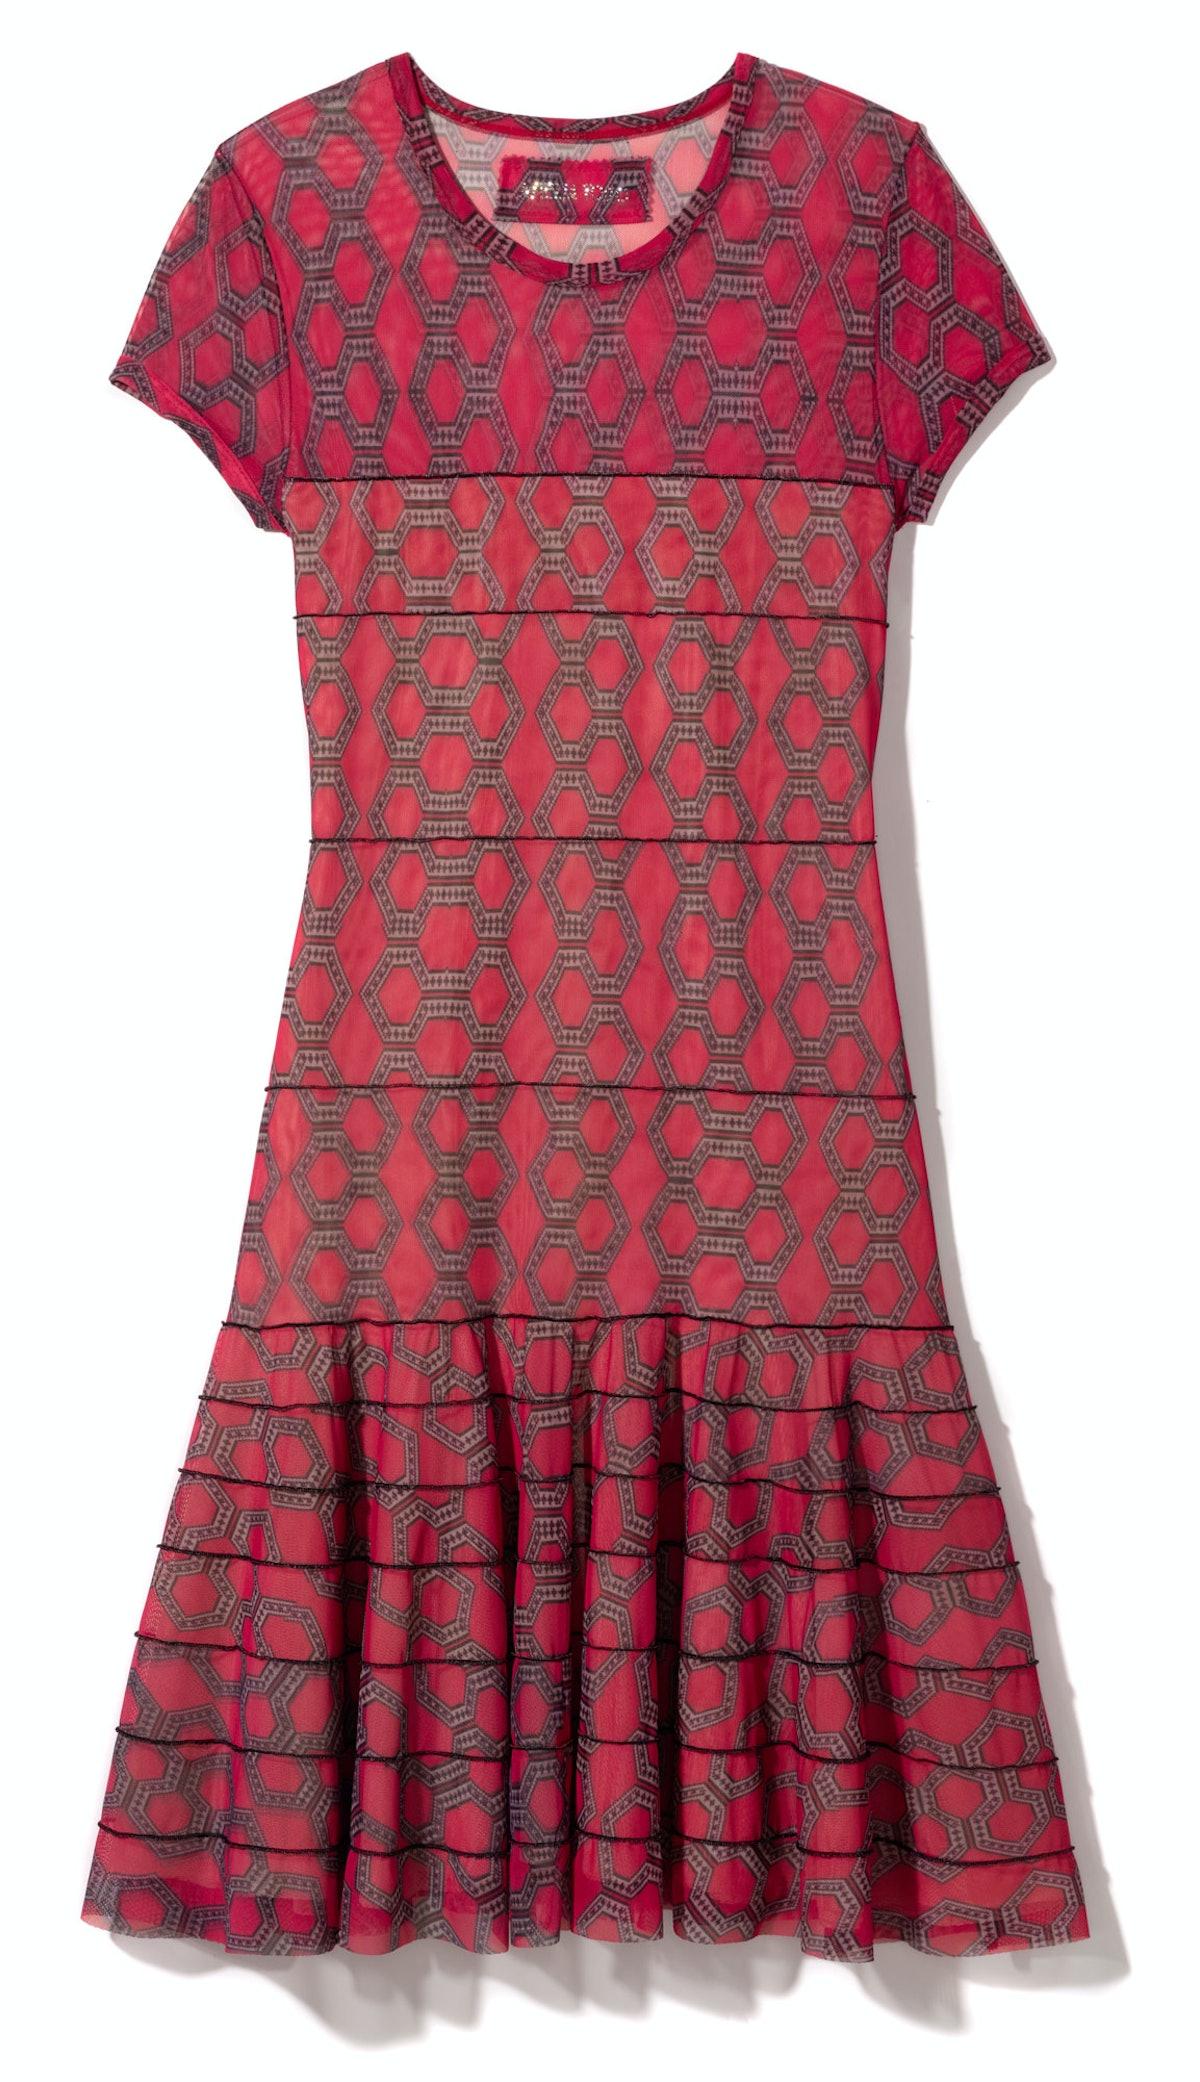 Amelia Toro dress, $970, Amelia Toro, New York, 212.337.8567.